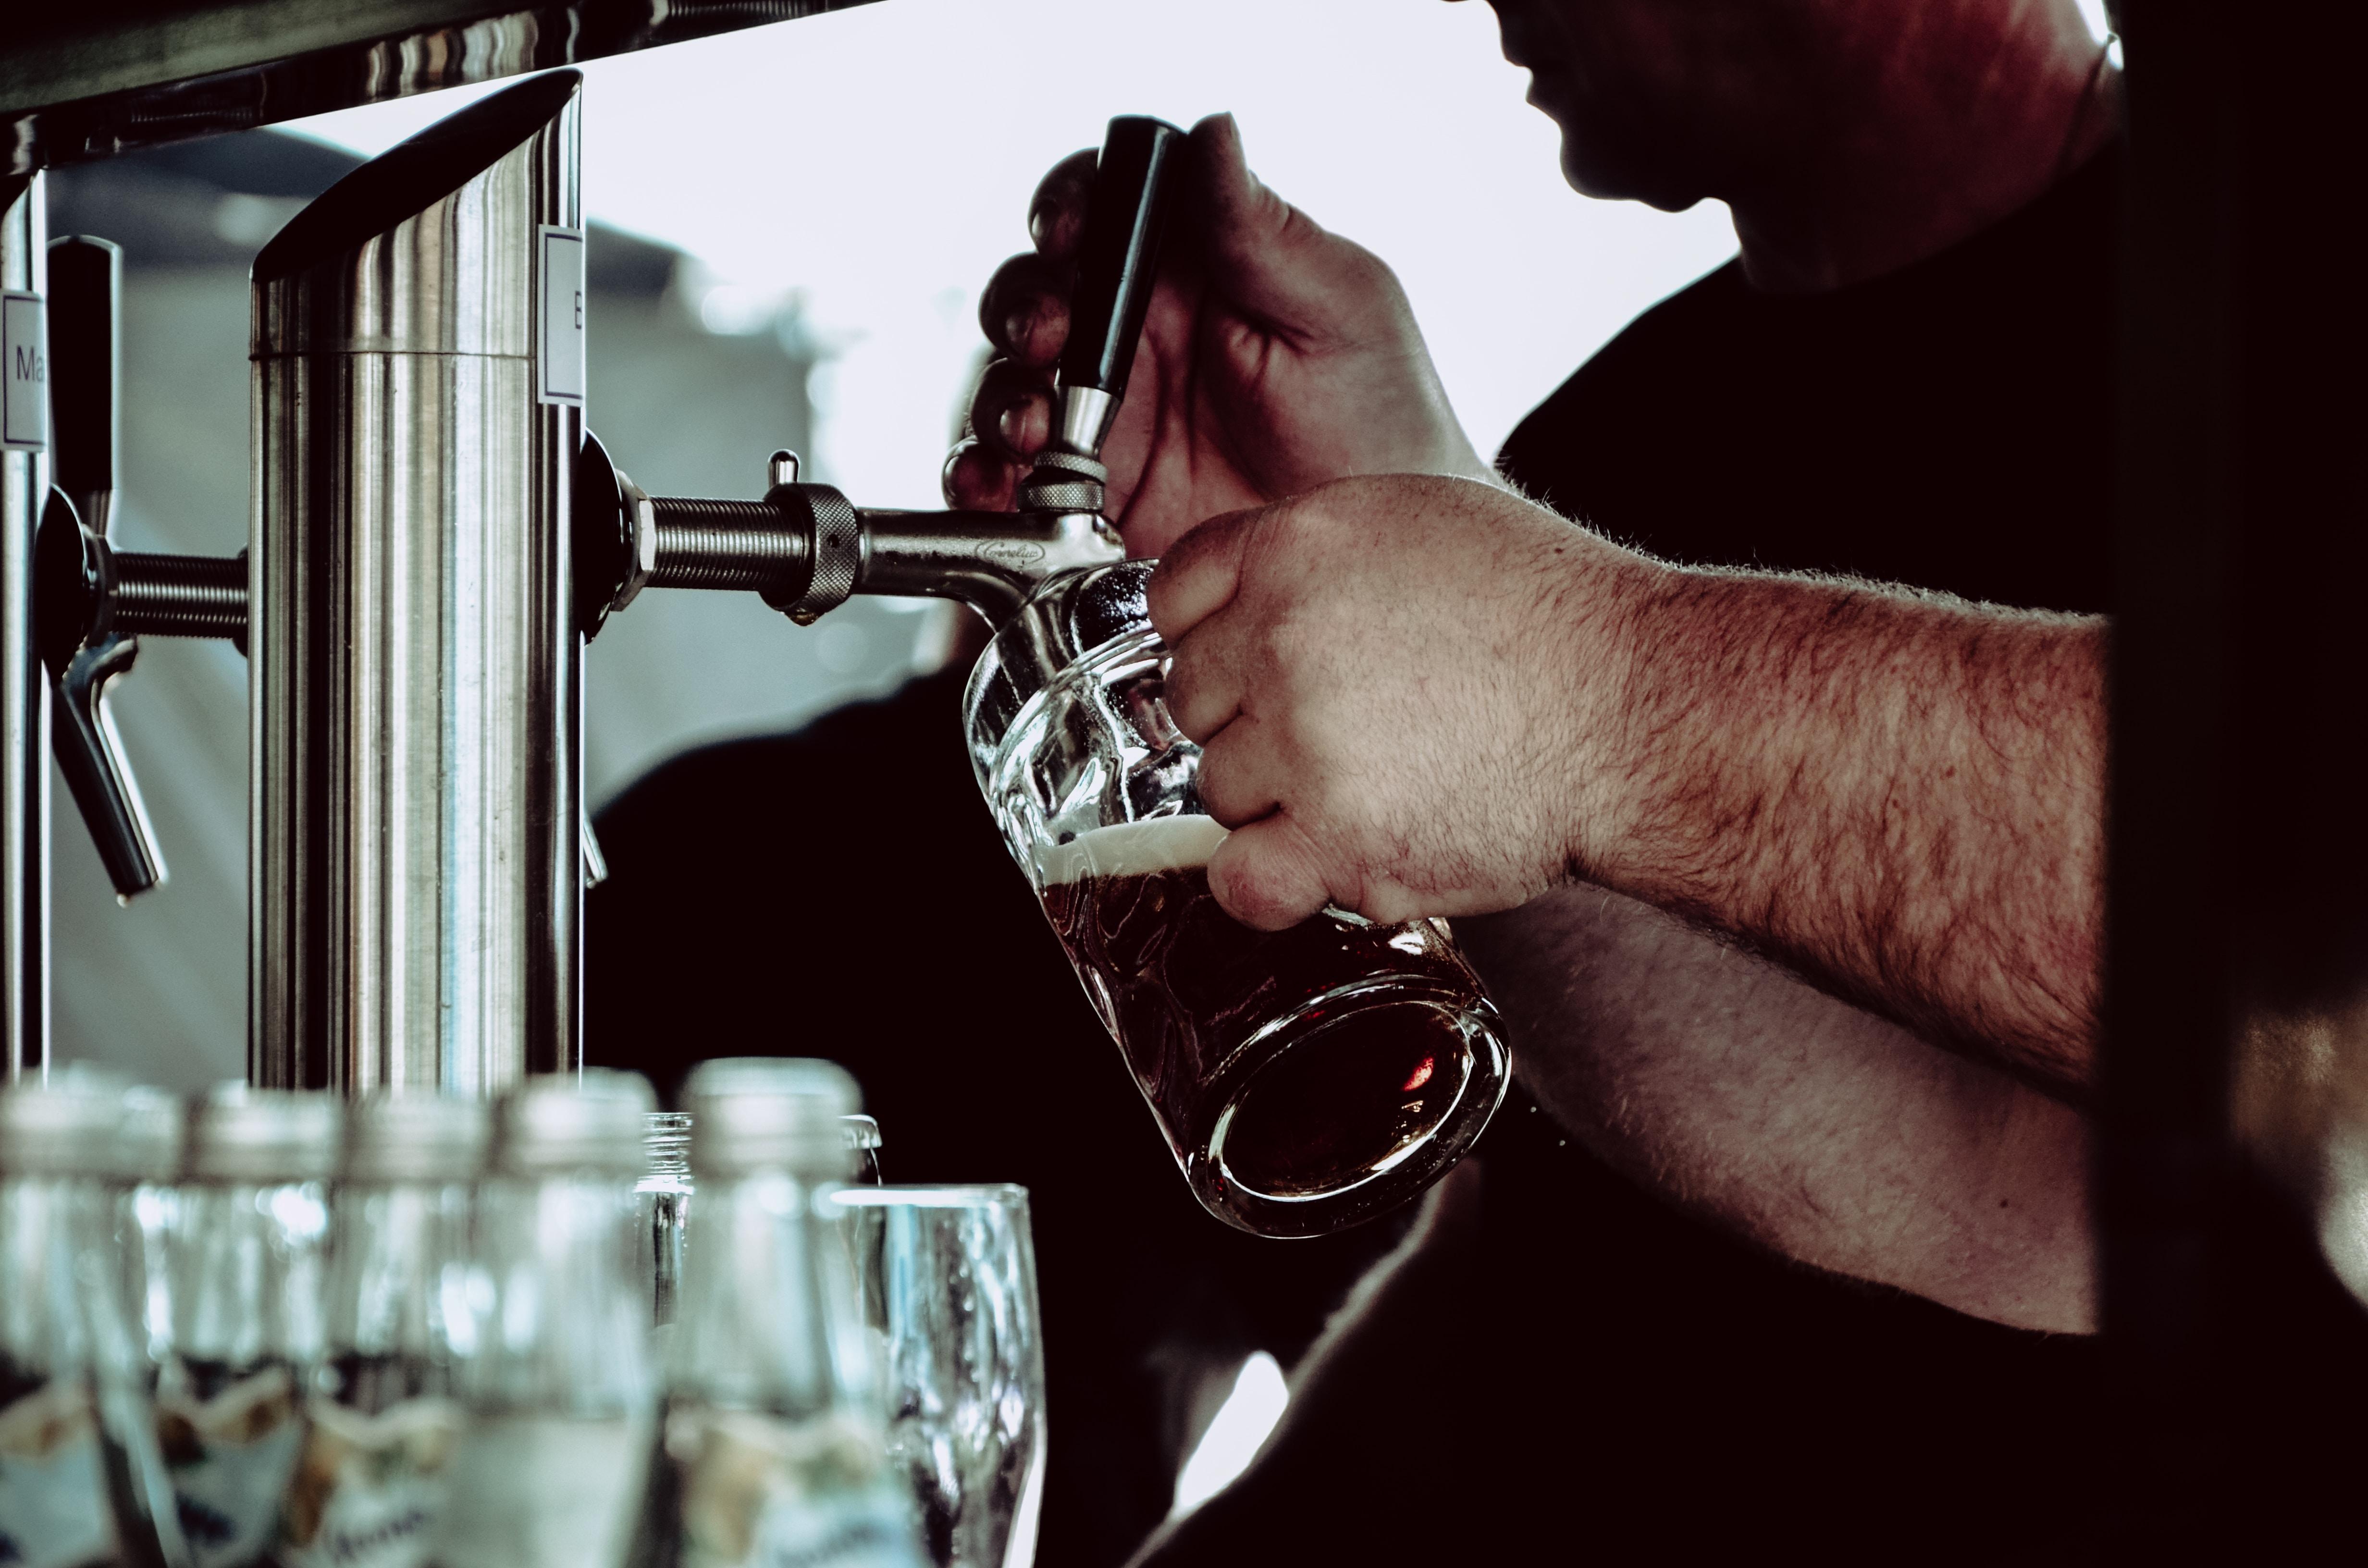 person holding beer mug